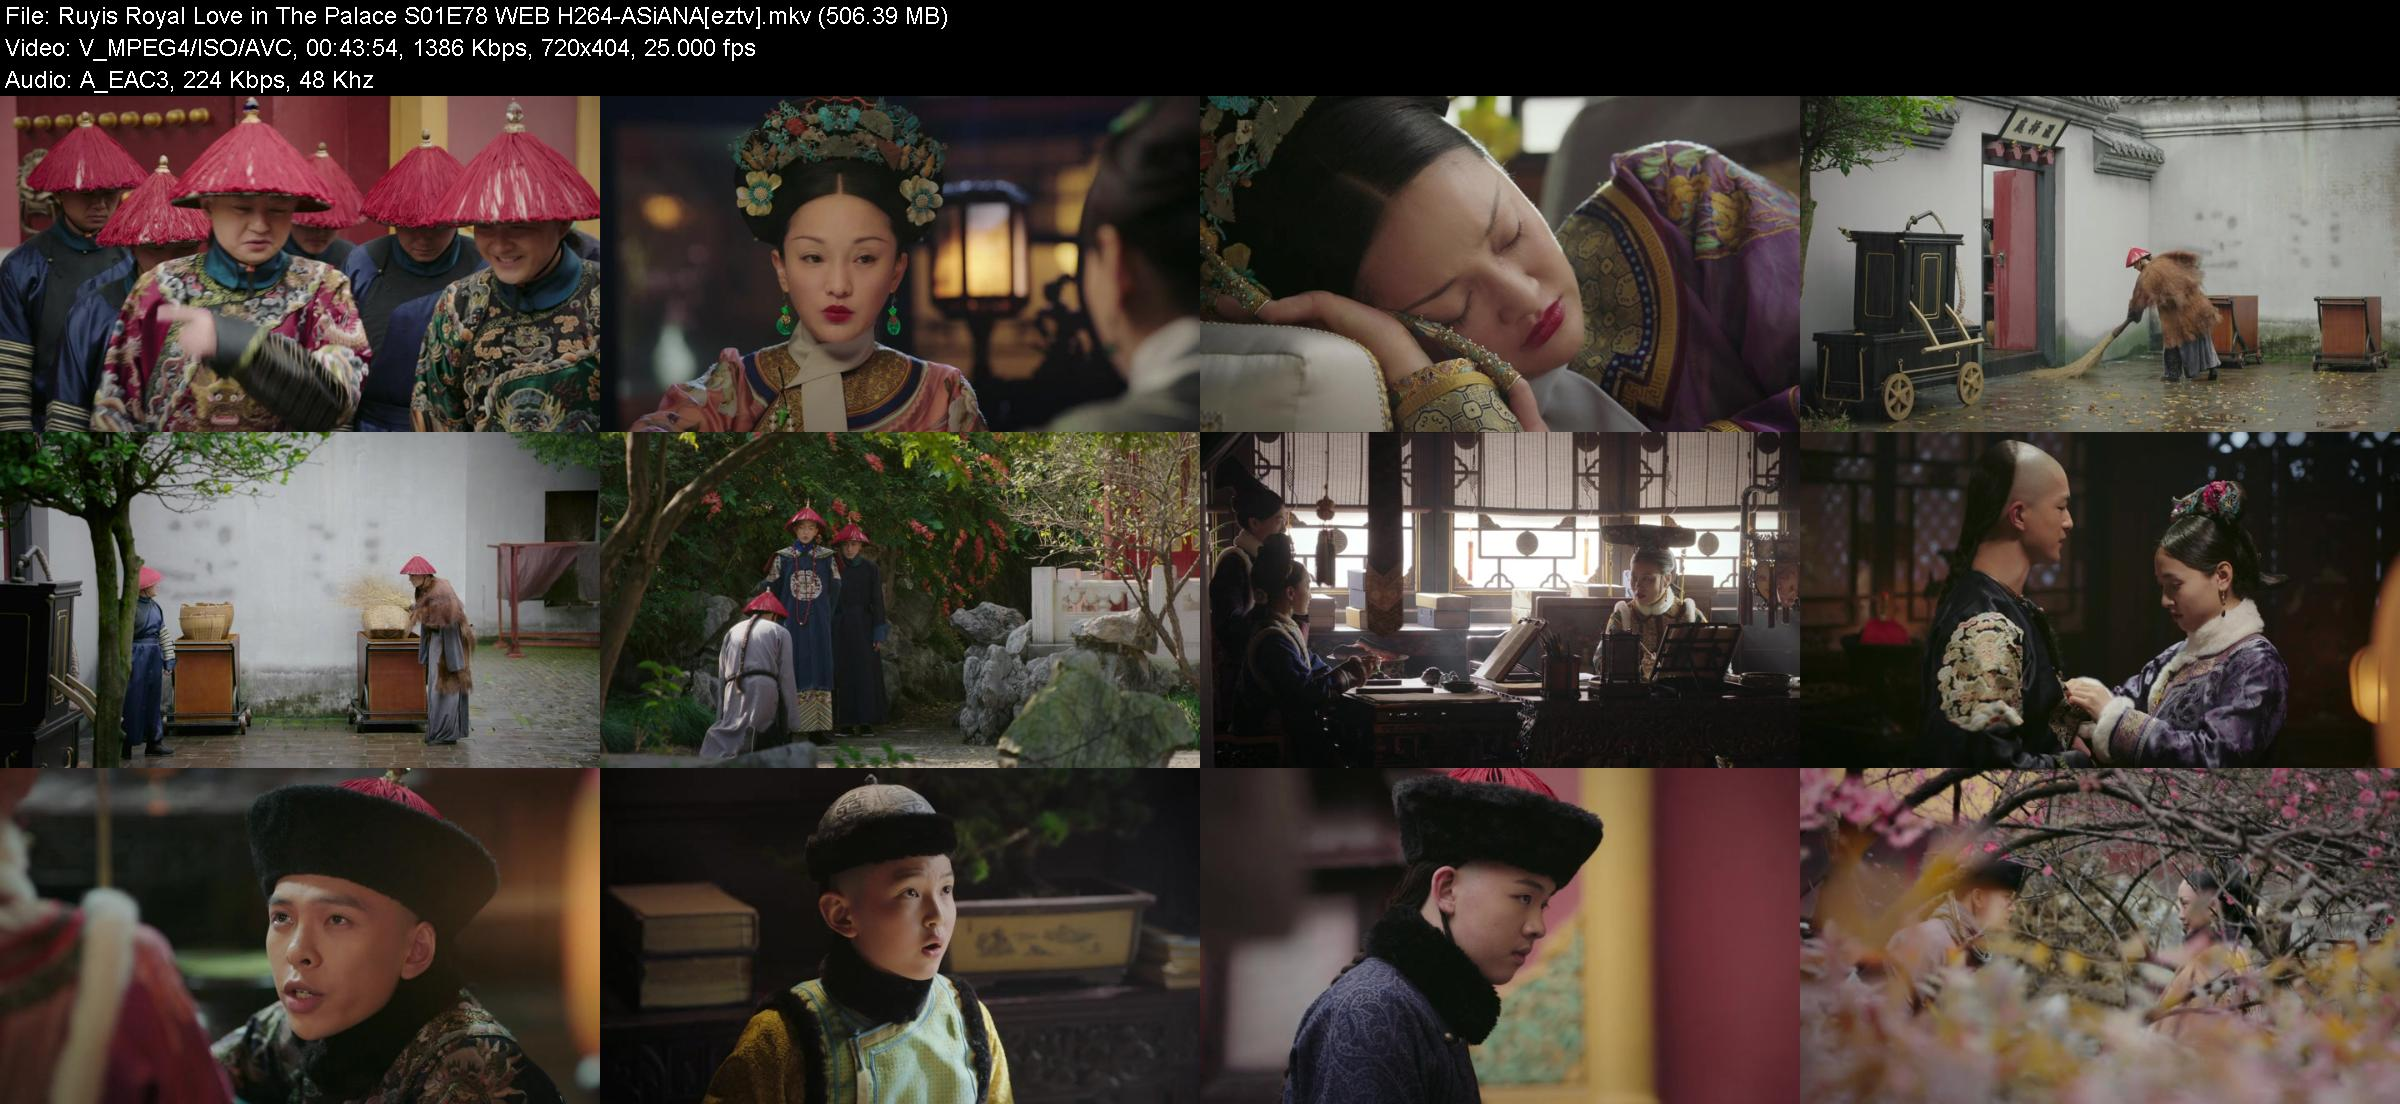 Ruyis Royal Love in The Palace S01E78 WEB H264-ASiANA